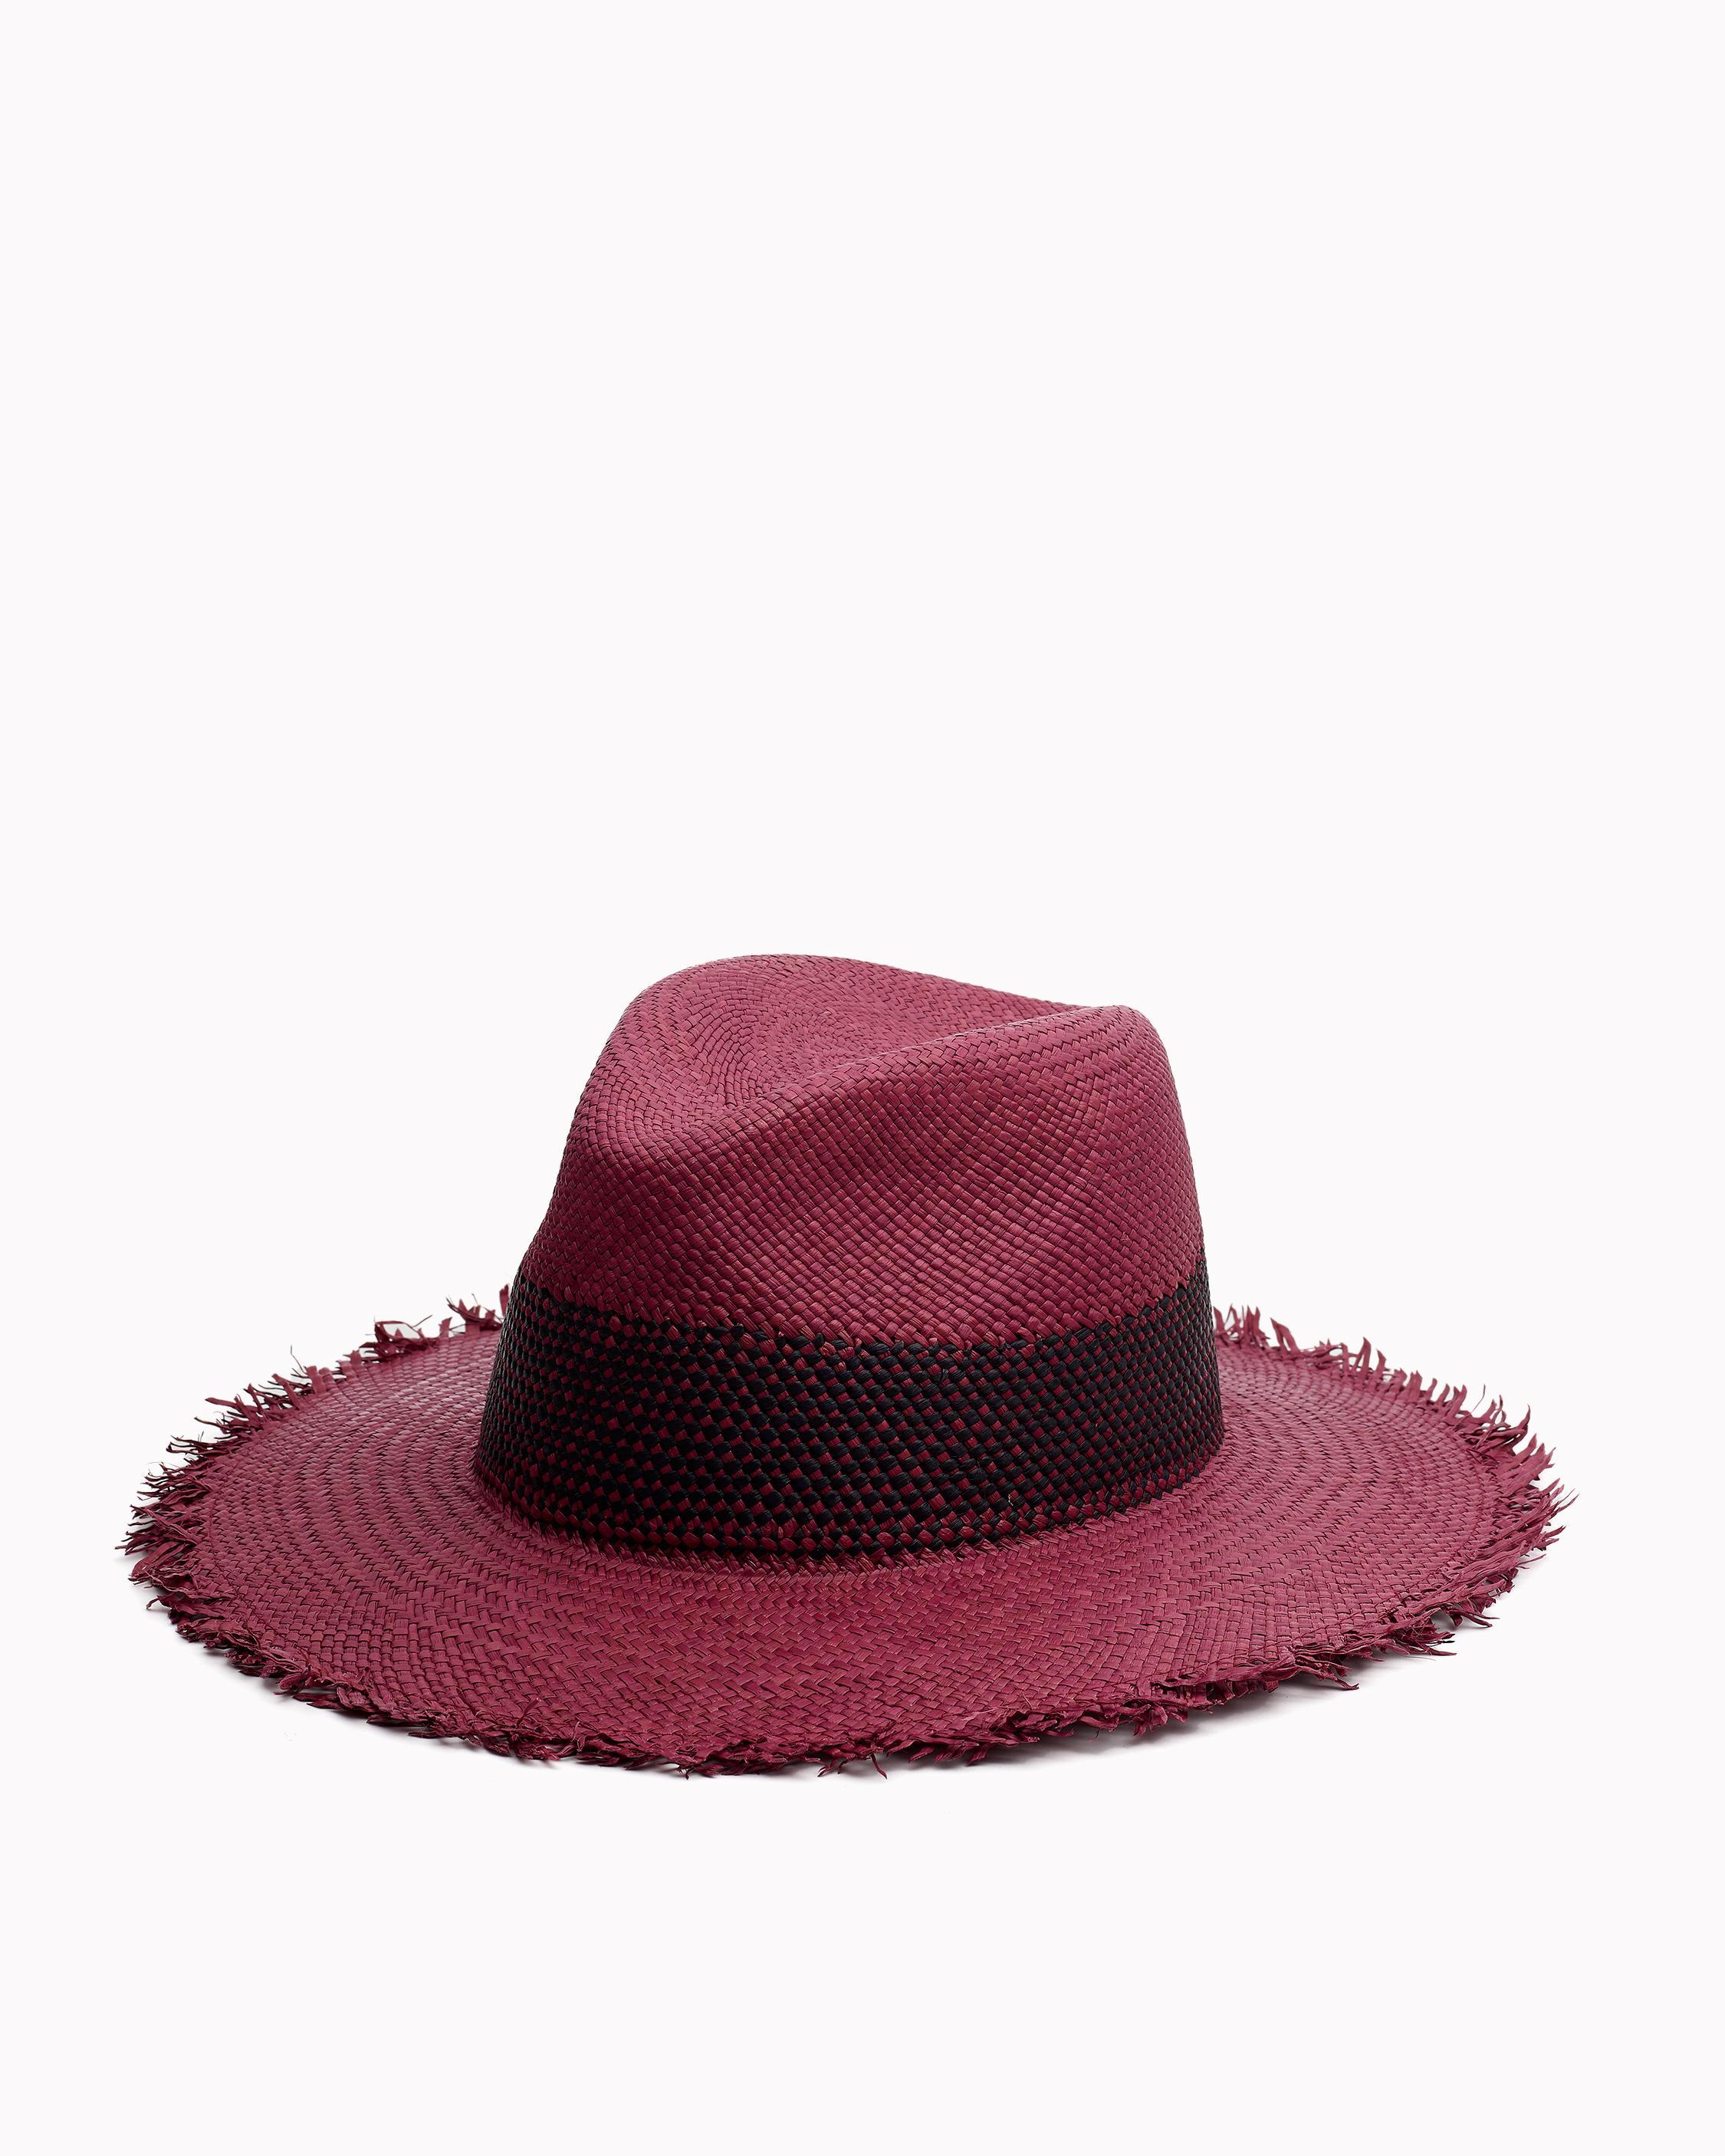 b3f2a8b357c20 Frayed Edge Panama Hat